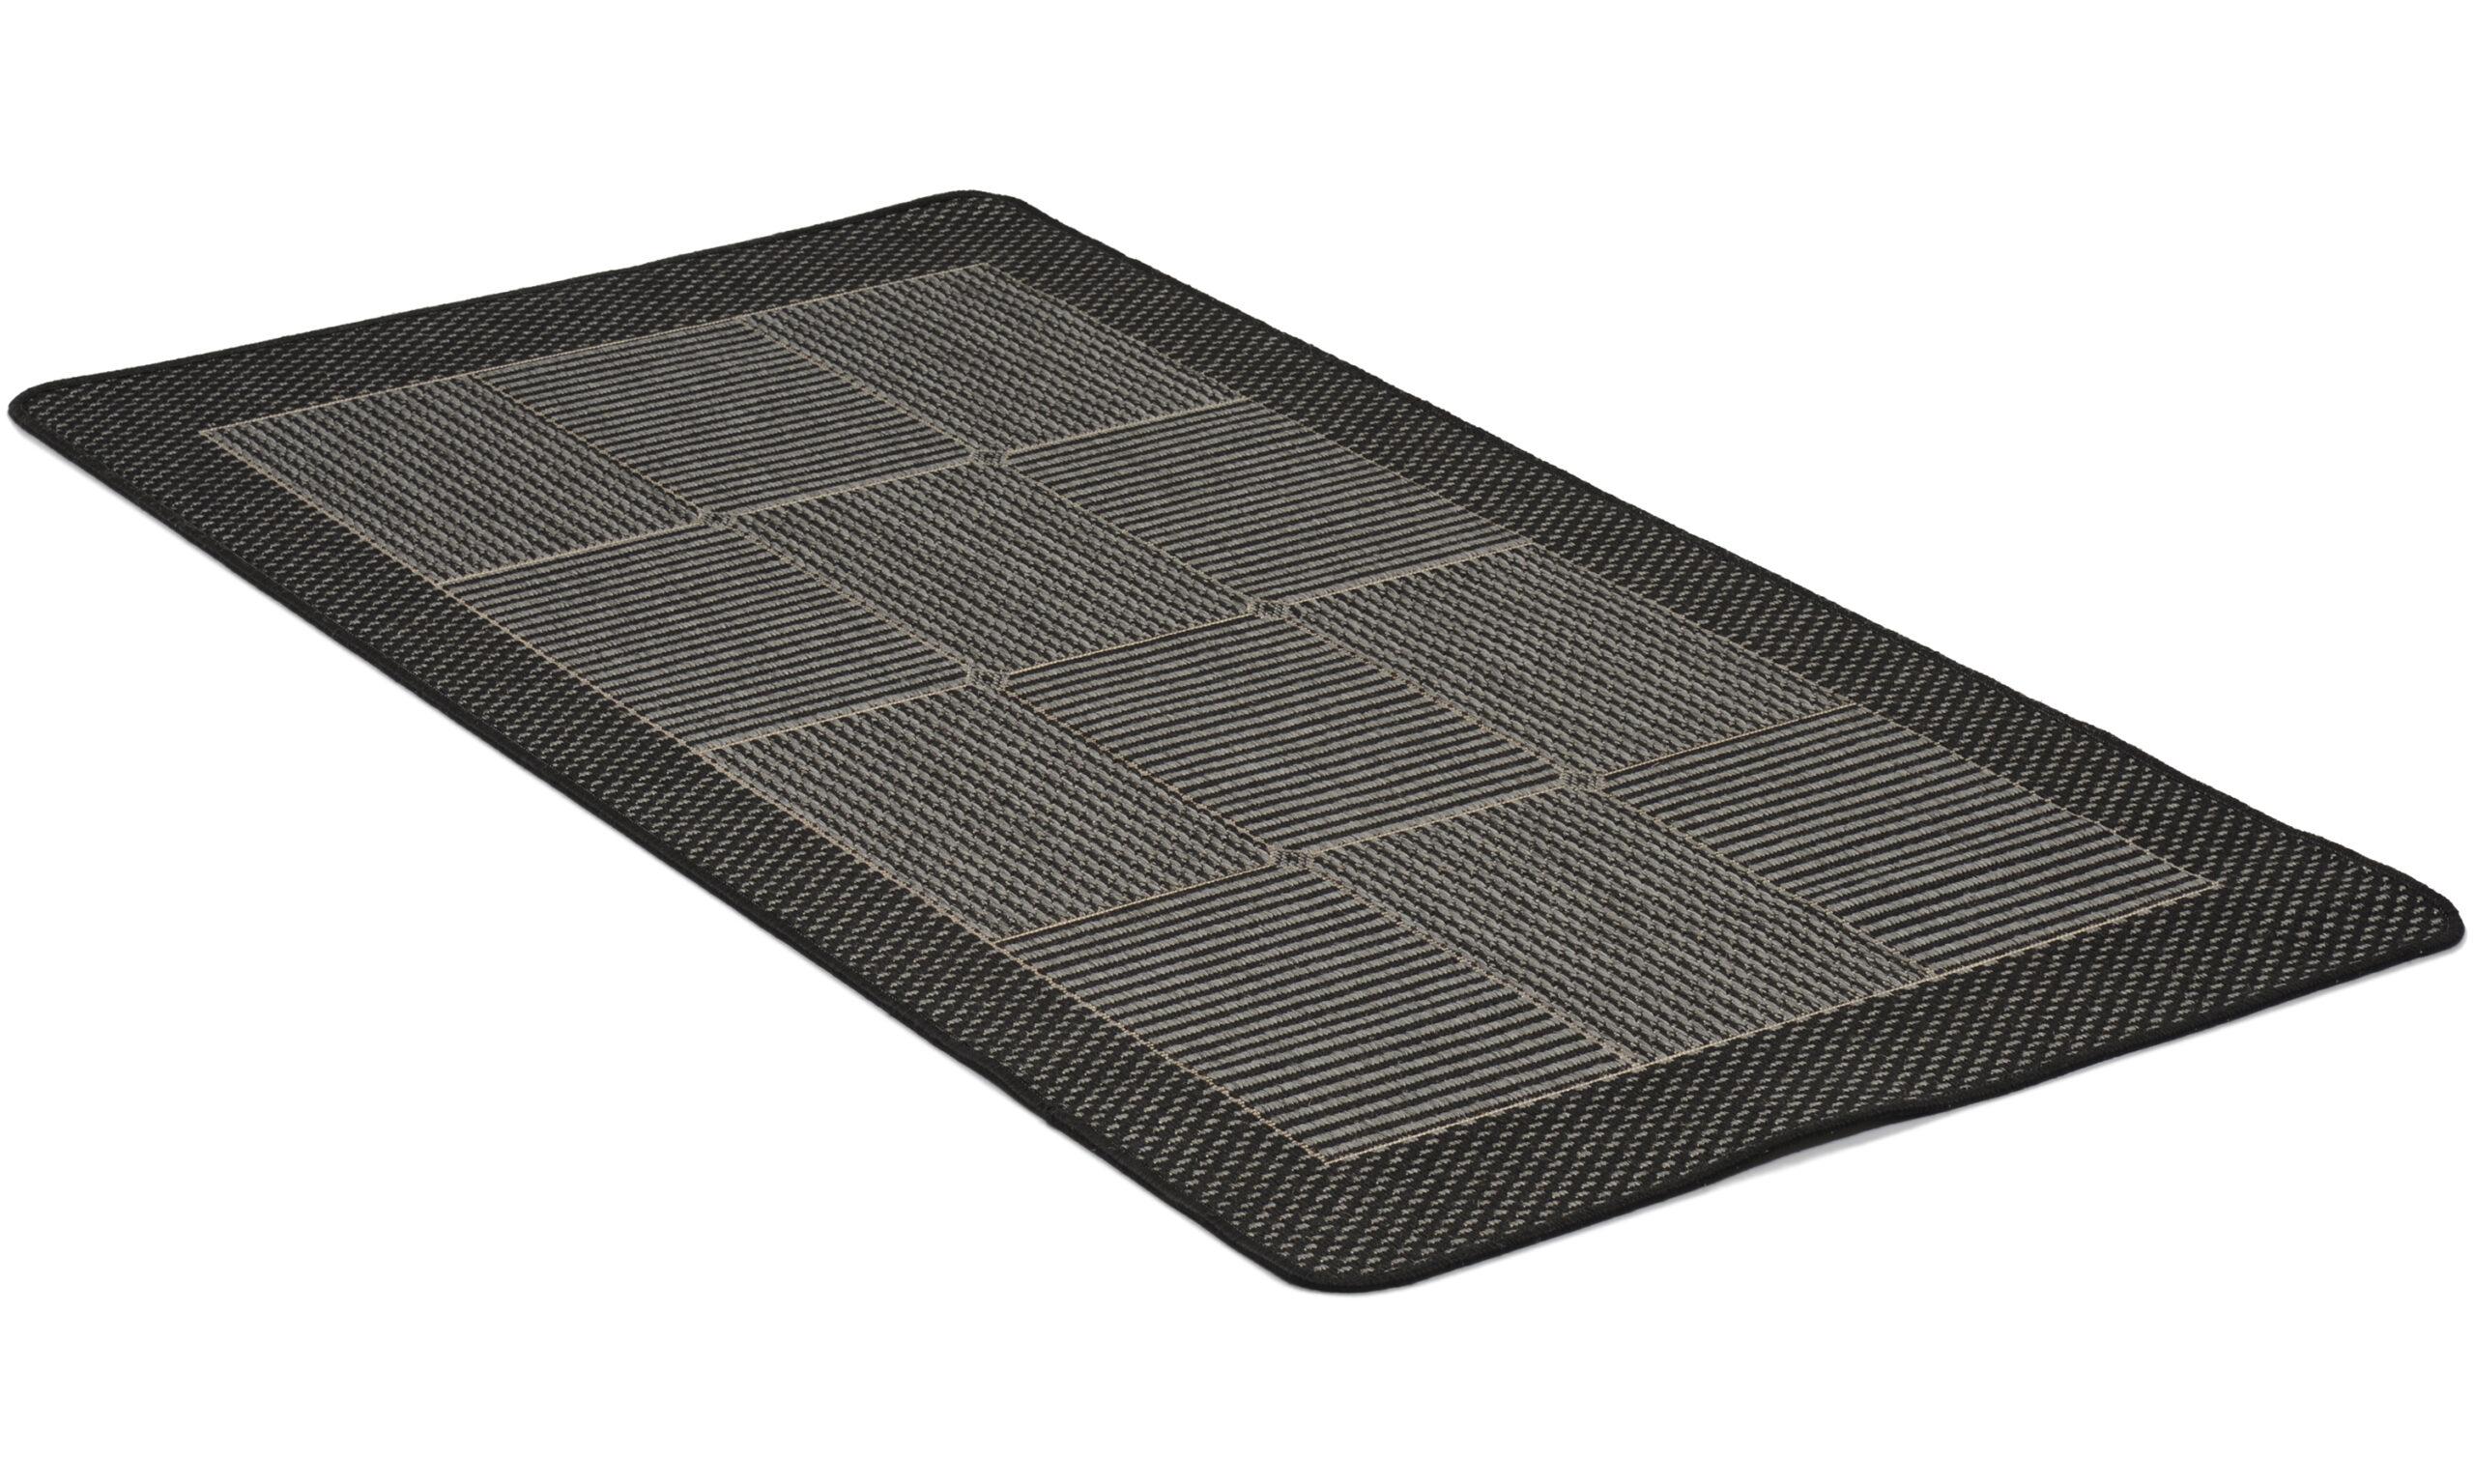 Brick grå - flatvevd teppe med gummibakside